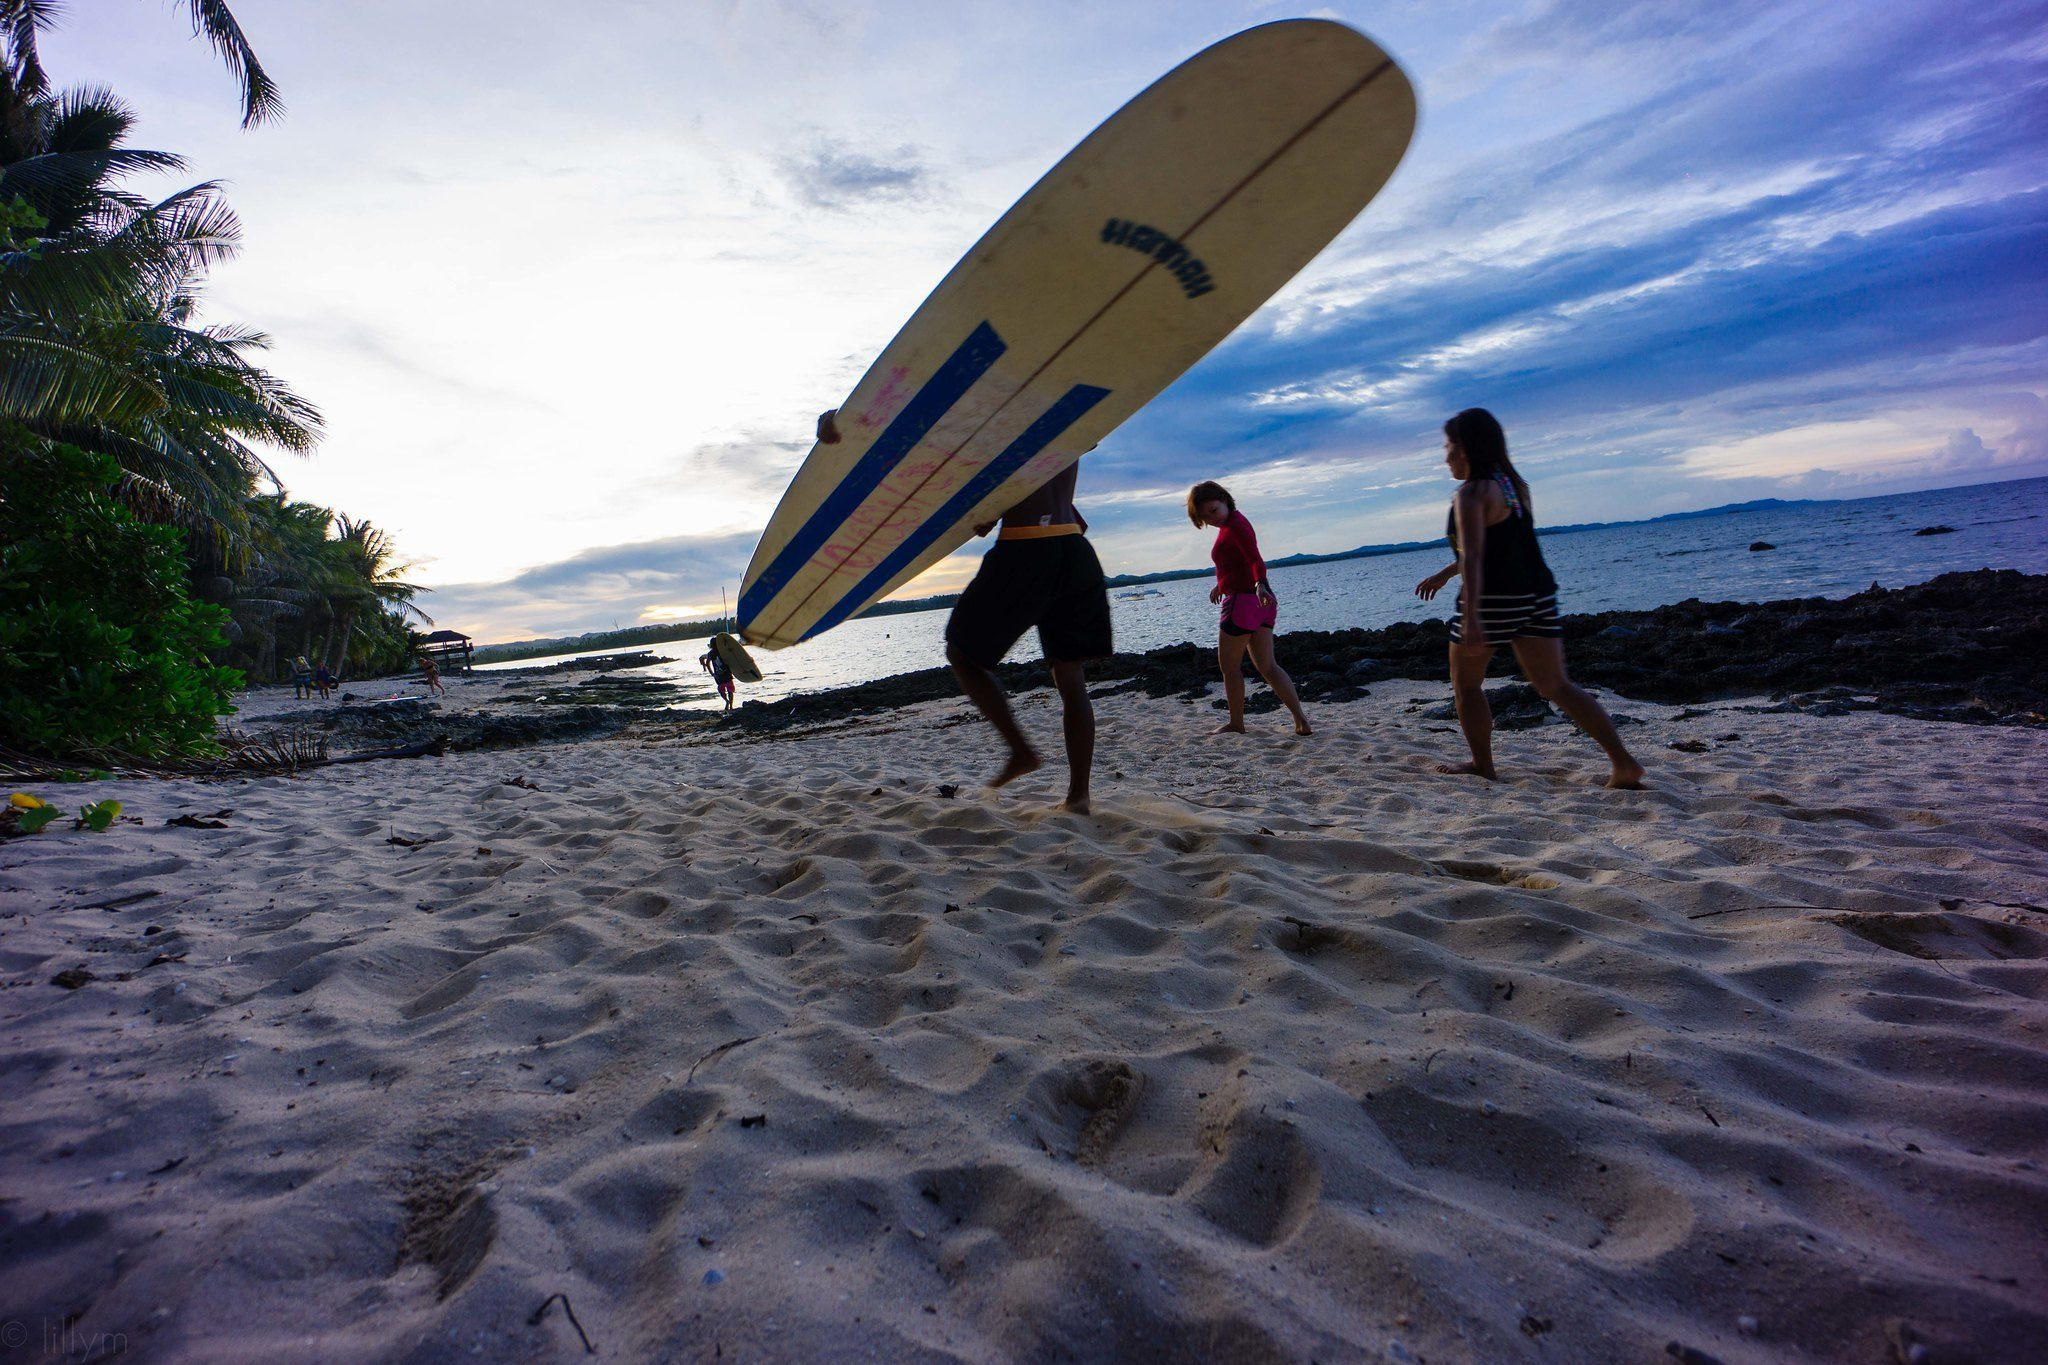 Best Surfing Destinations in the Philippines